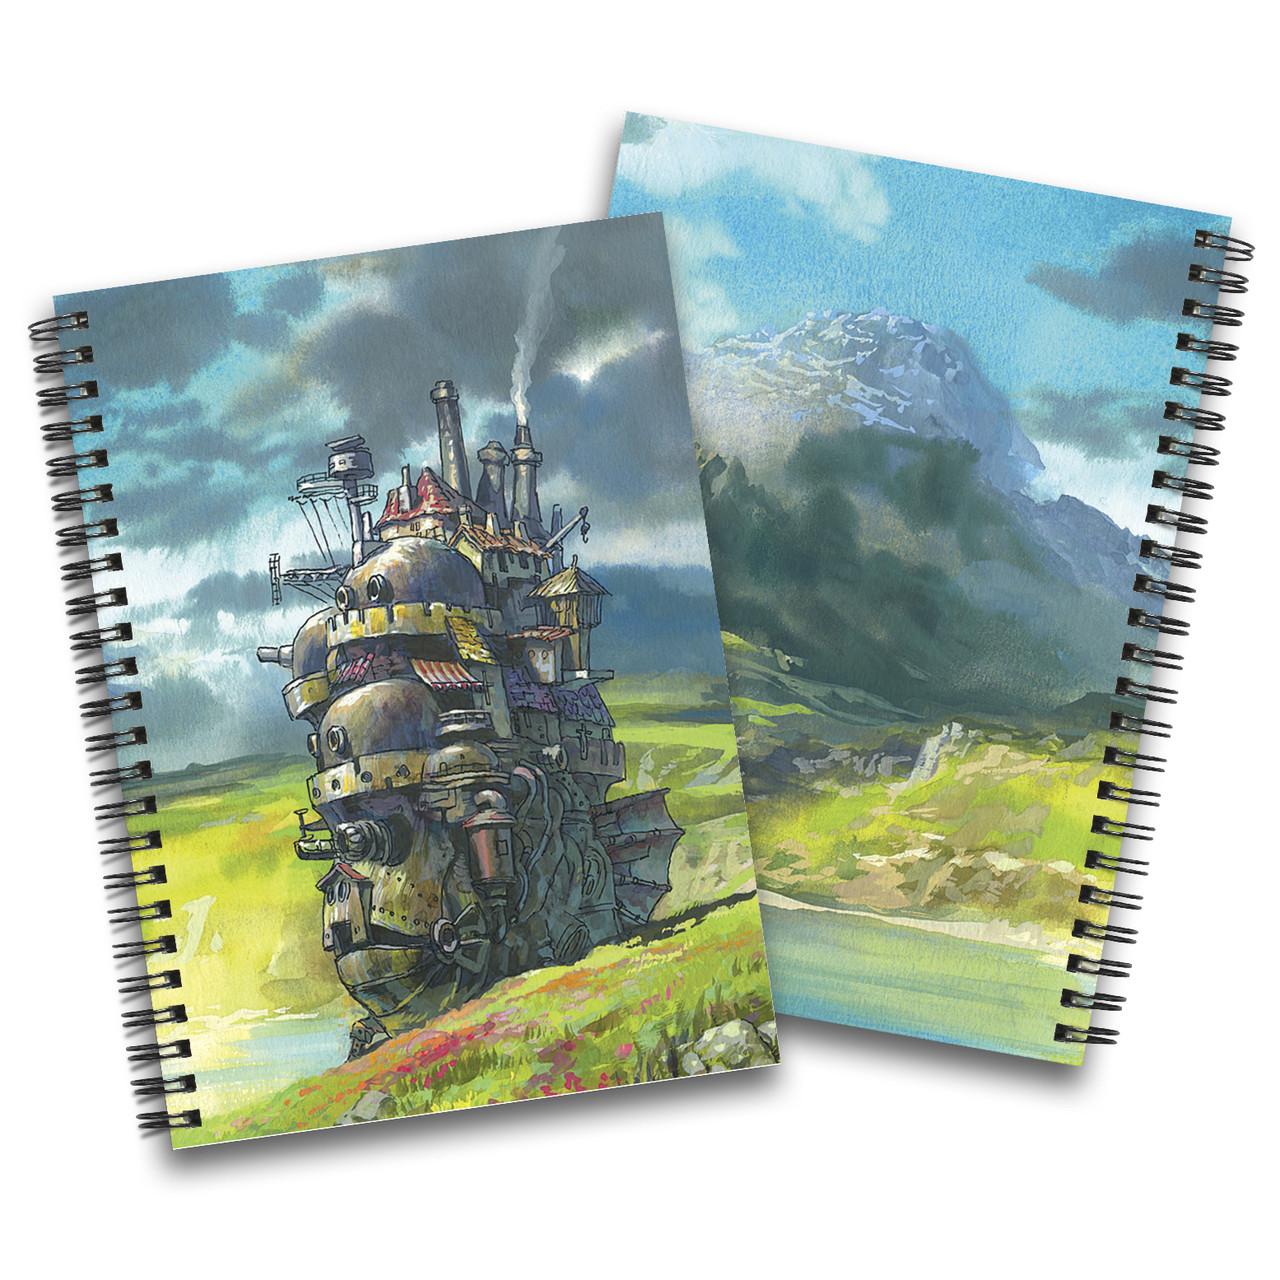 Скетчбук Ходячий замок | Howl's Moving Castle 04